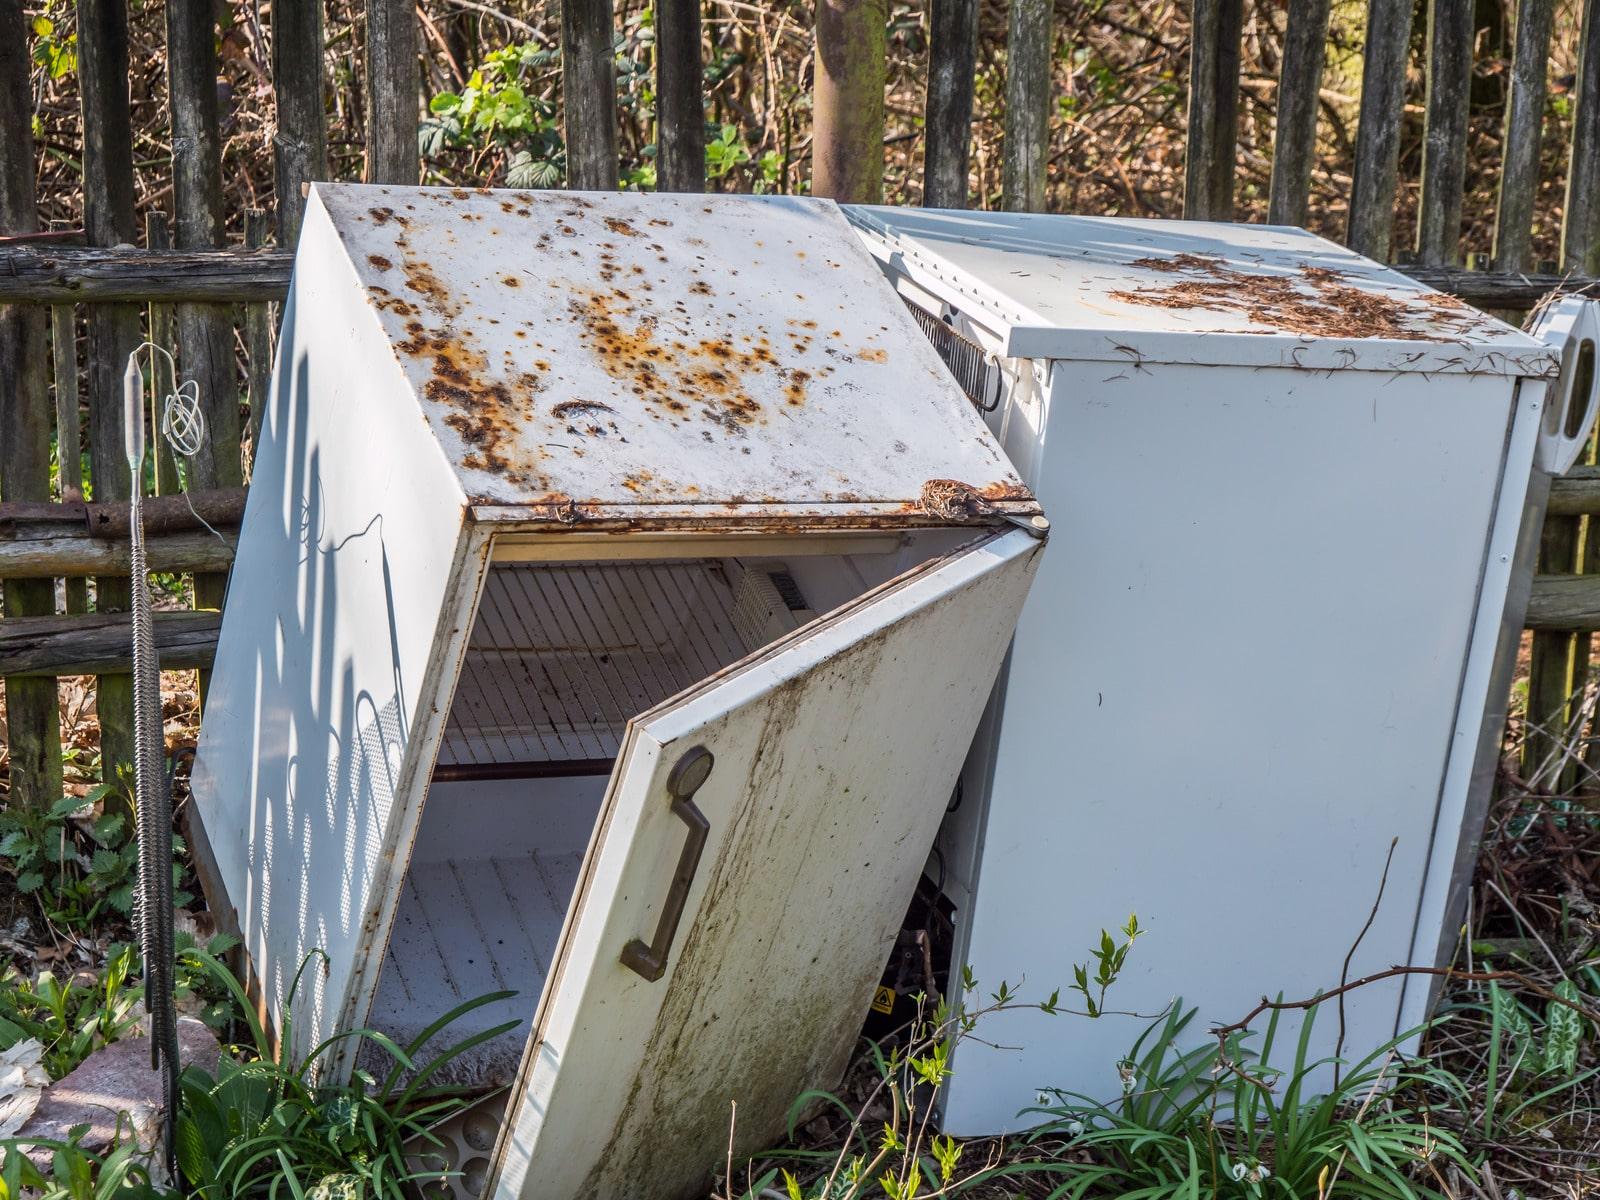 Environmental problem old fridge